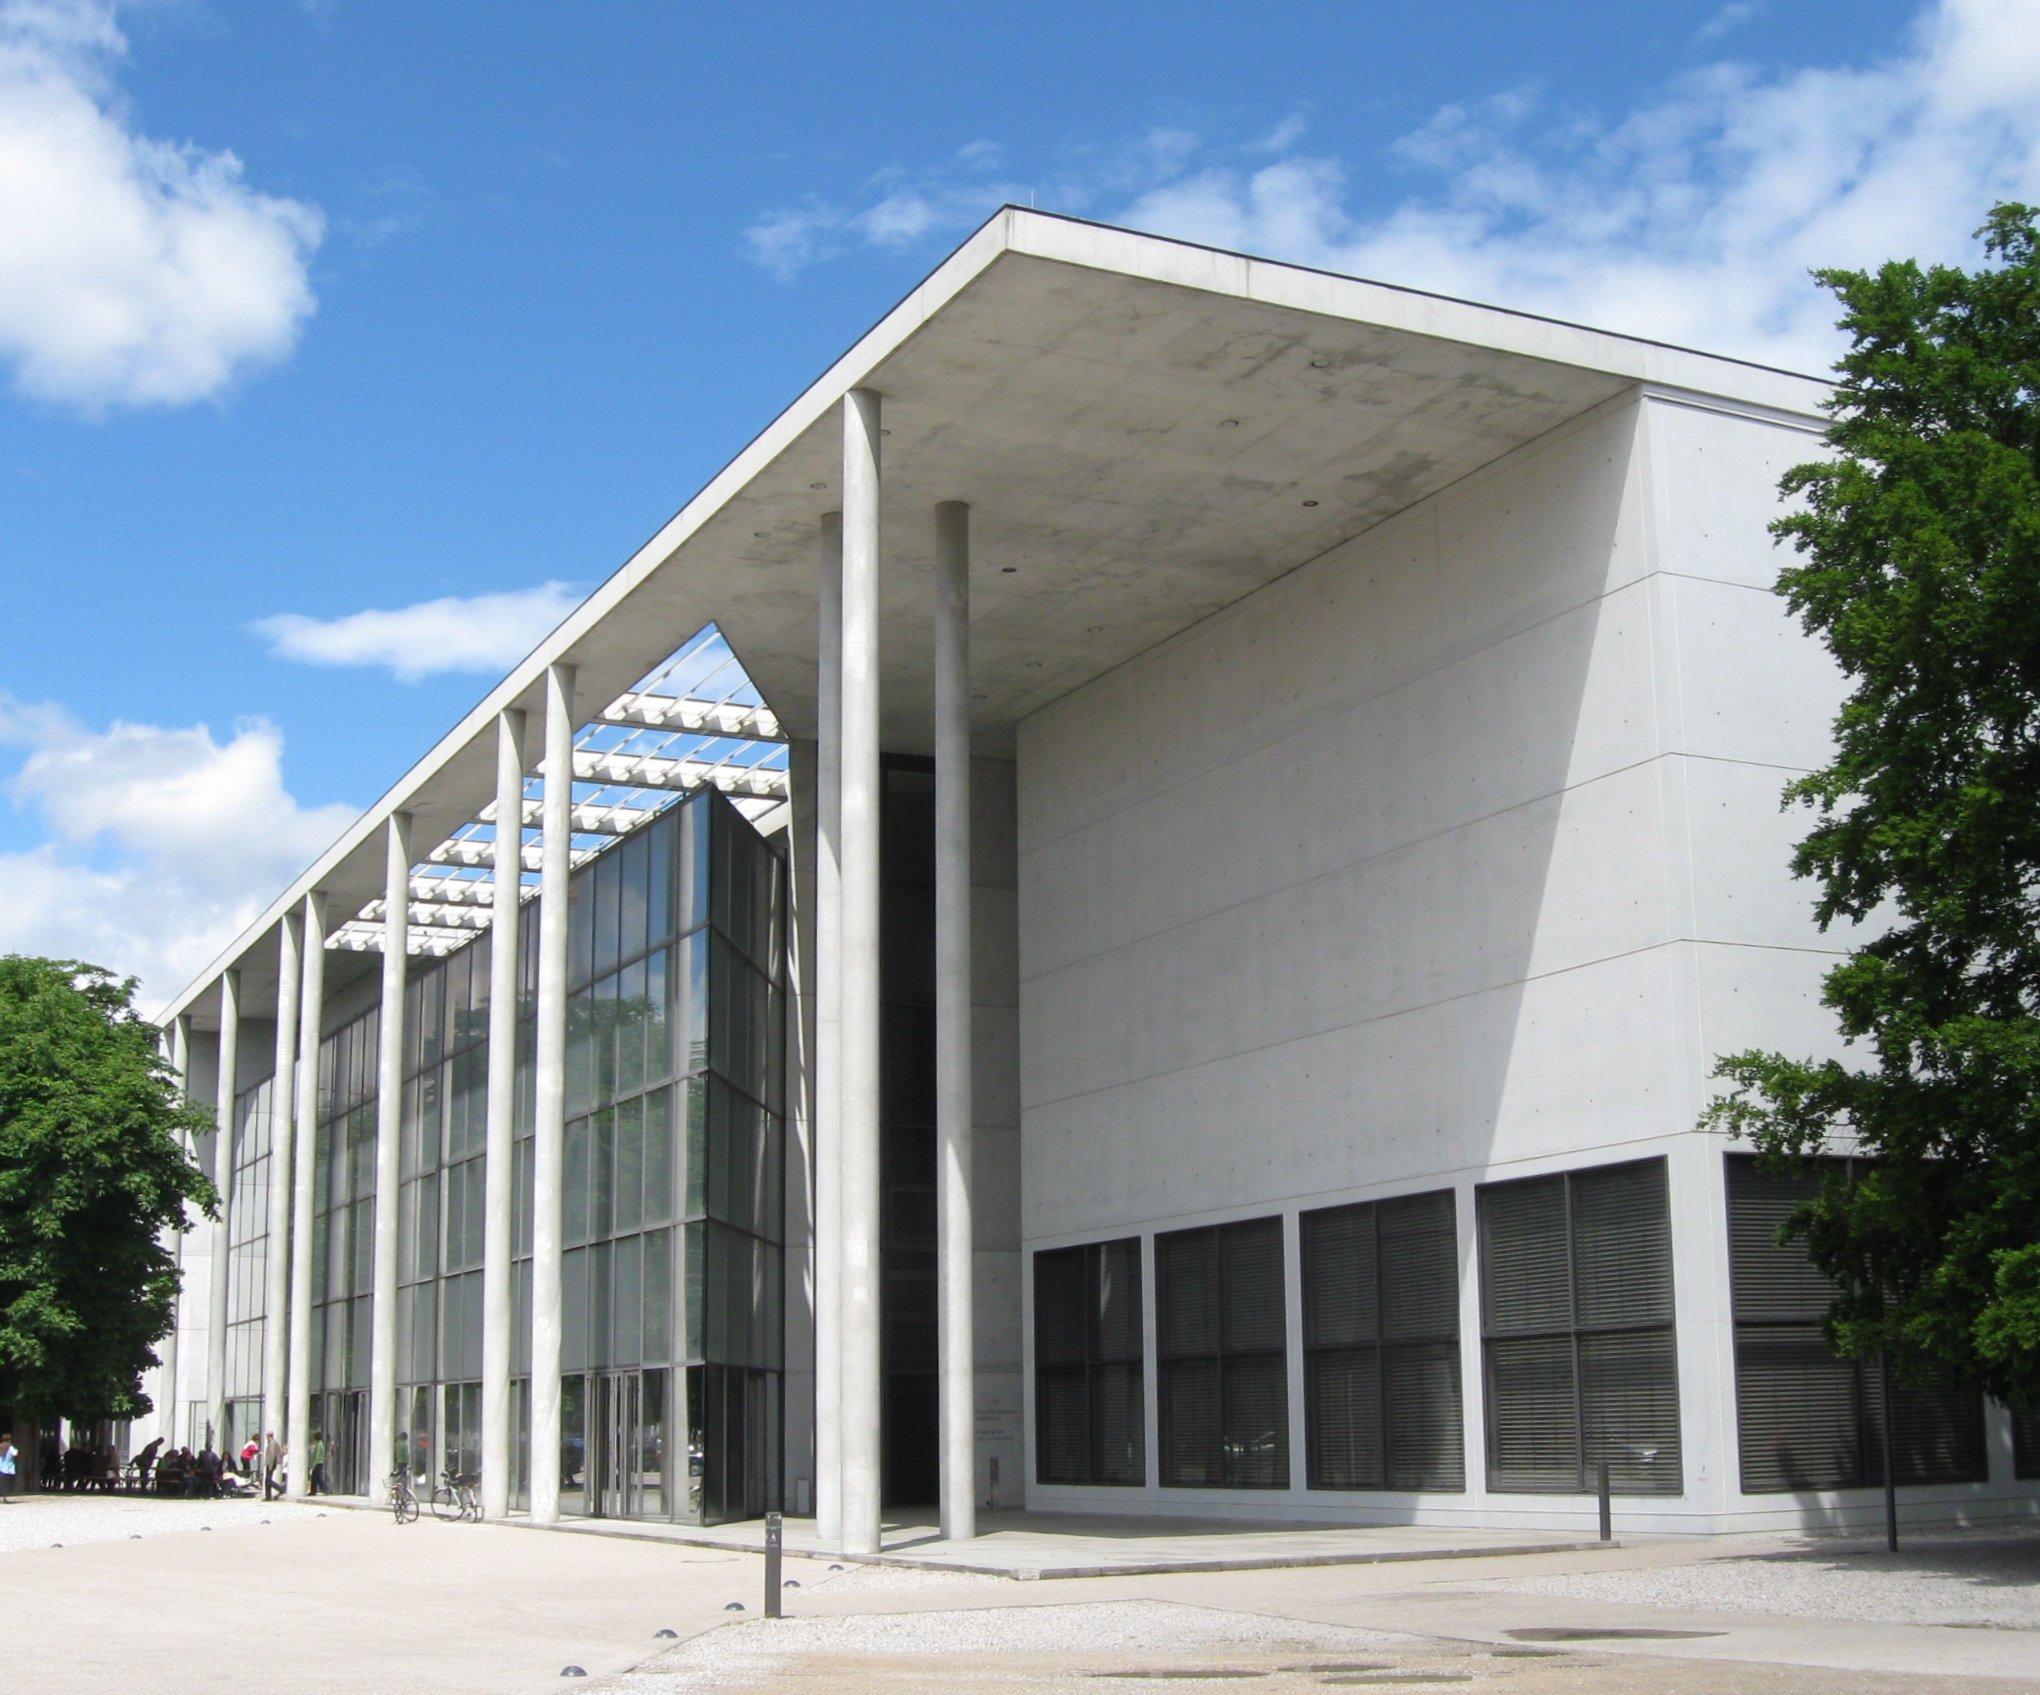 Schmela-Haus, Düsseldorf, Germany  rt Museums  Pinterest  Germany size: 2040 x 1695 post ID: 3 File size: 0 B